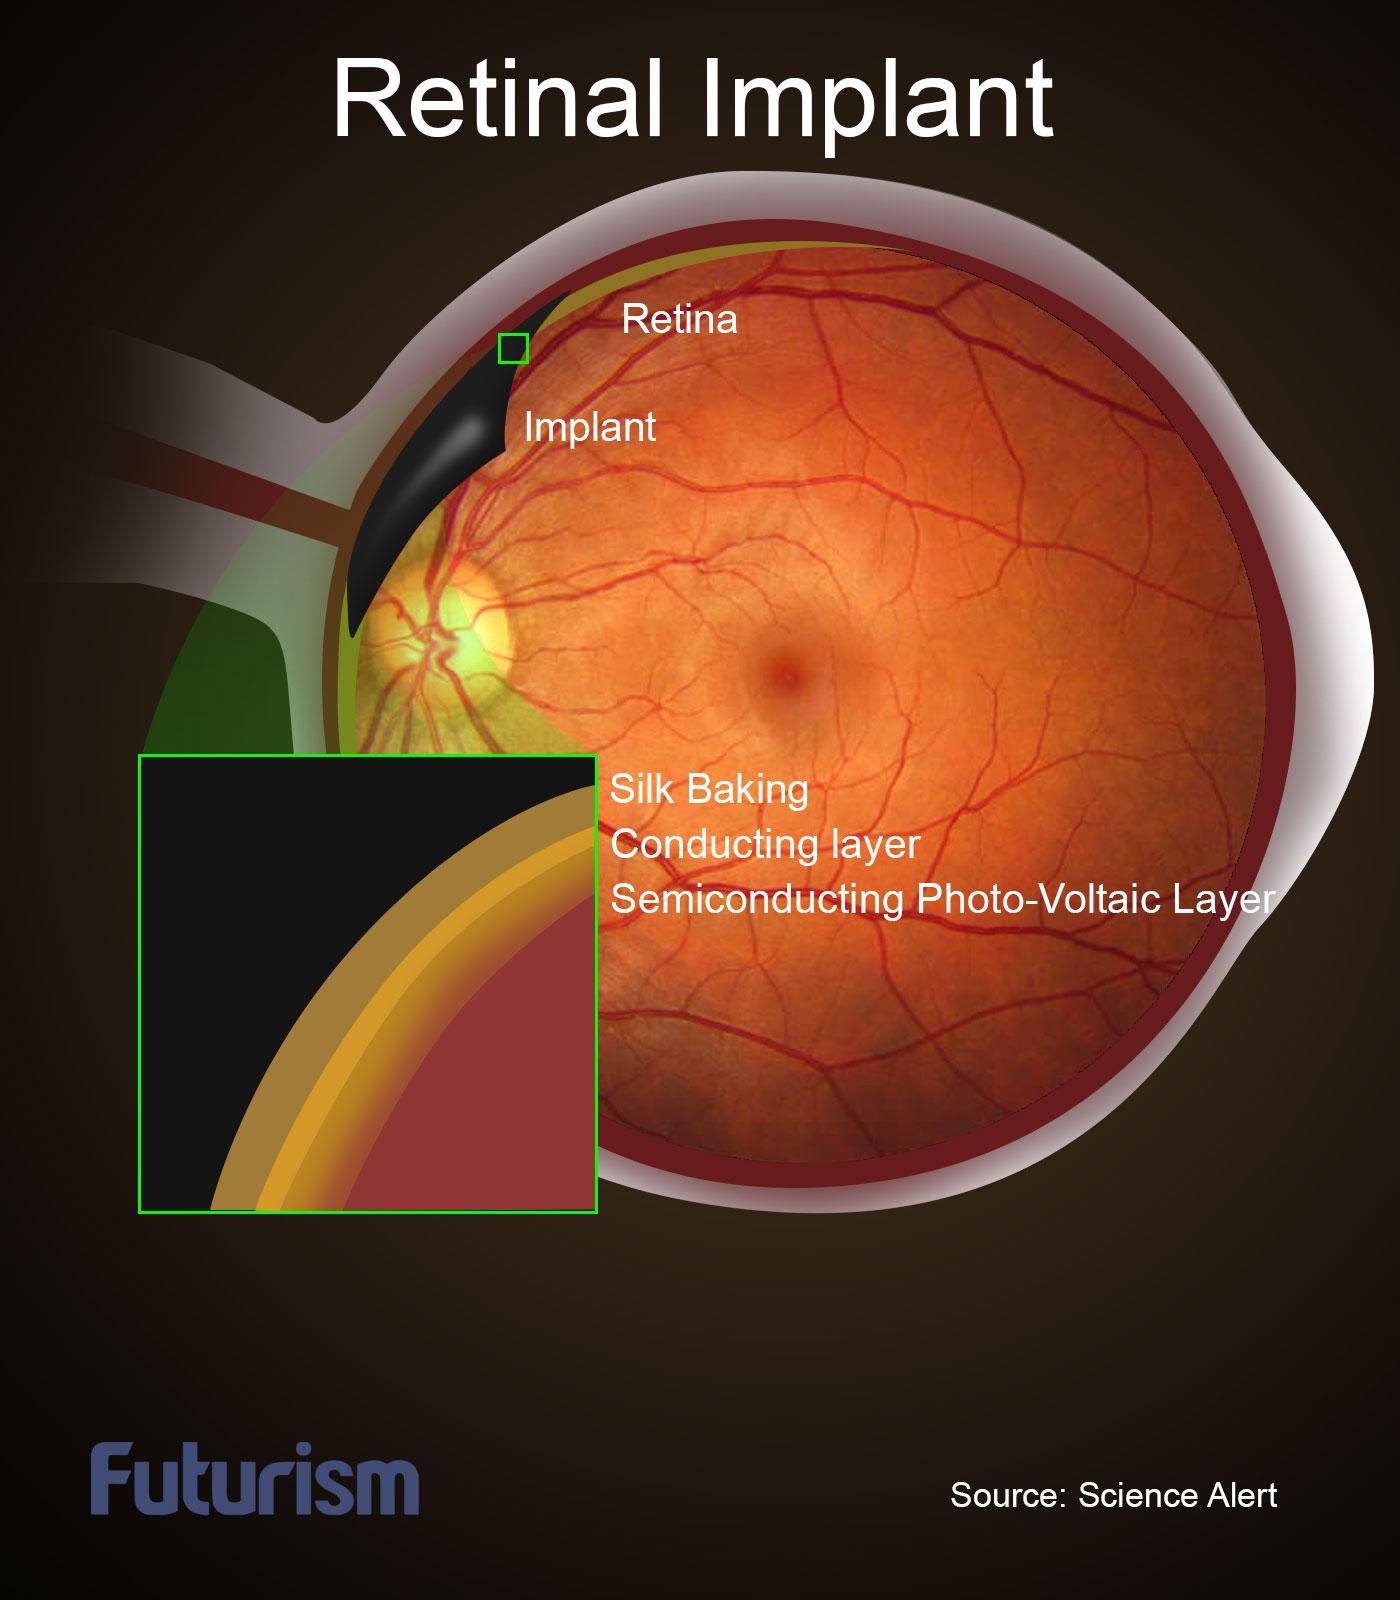 retinal-implant-futurism